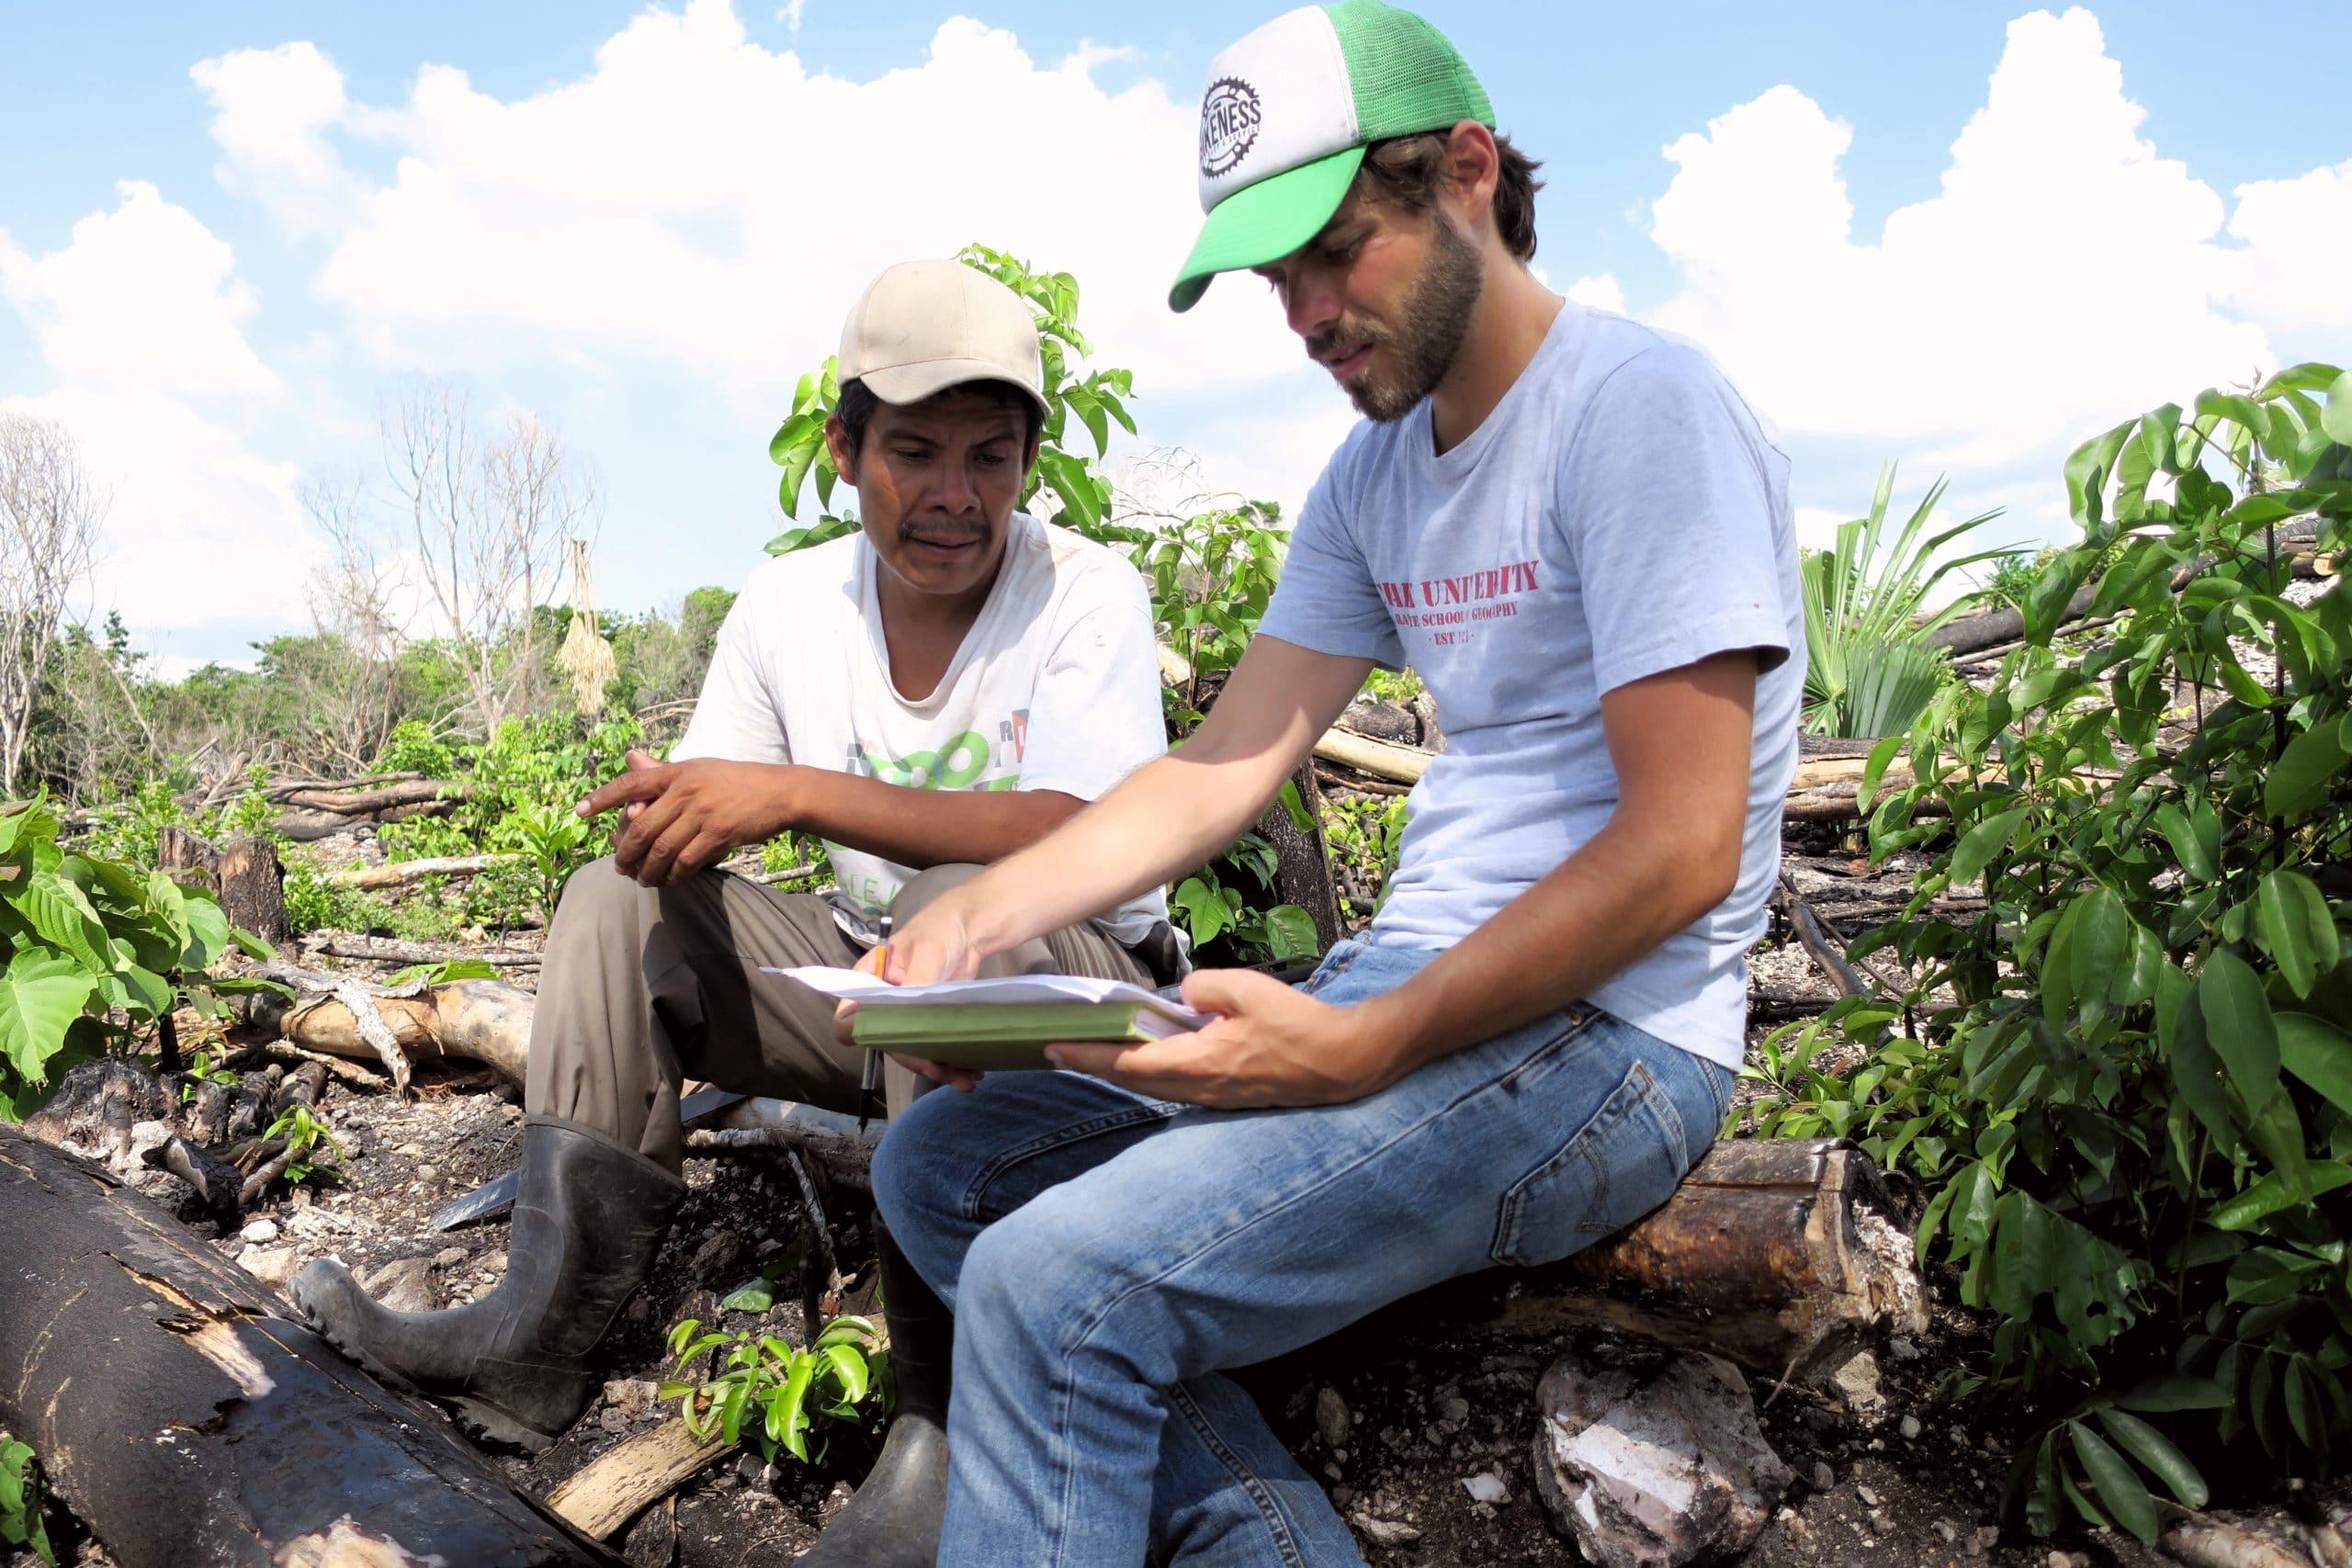 carlos dobler conducting field interviews